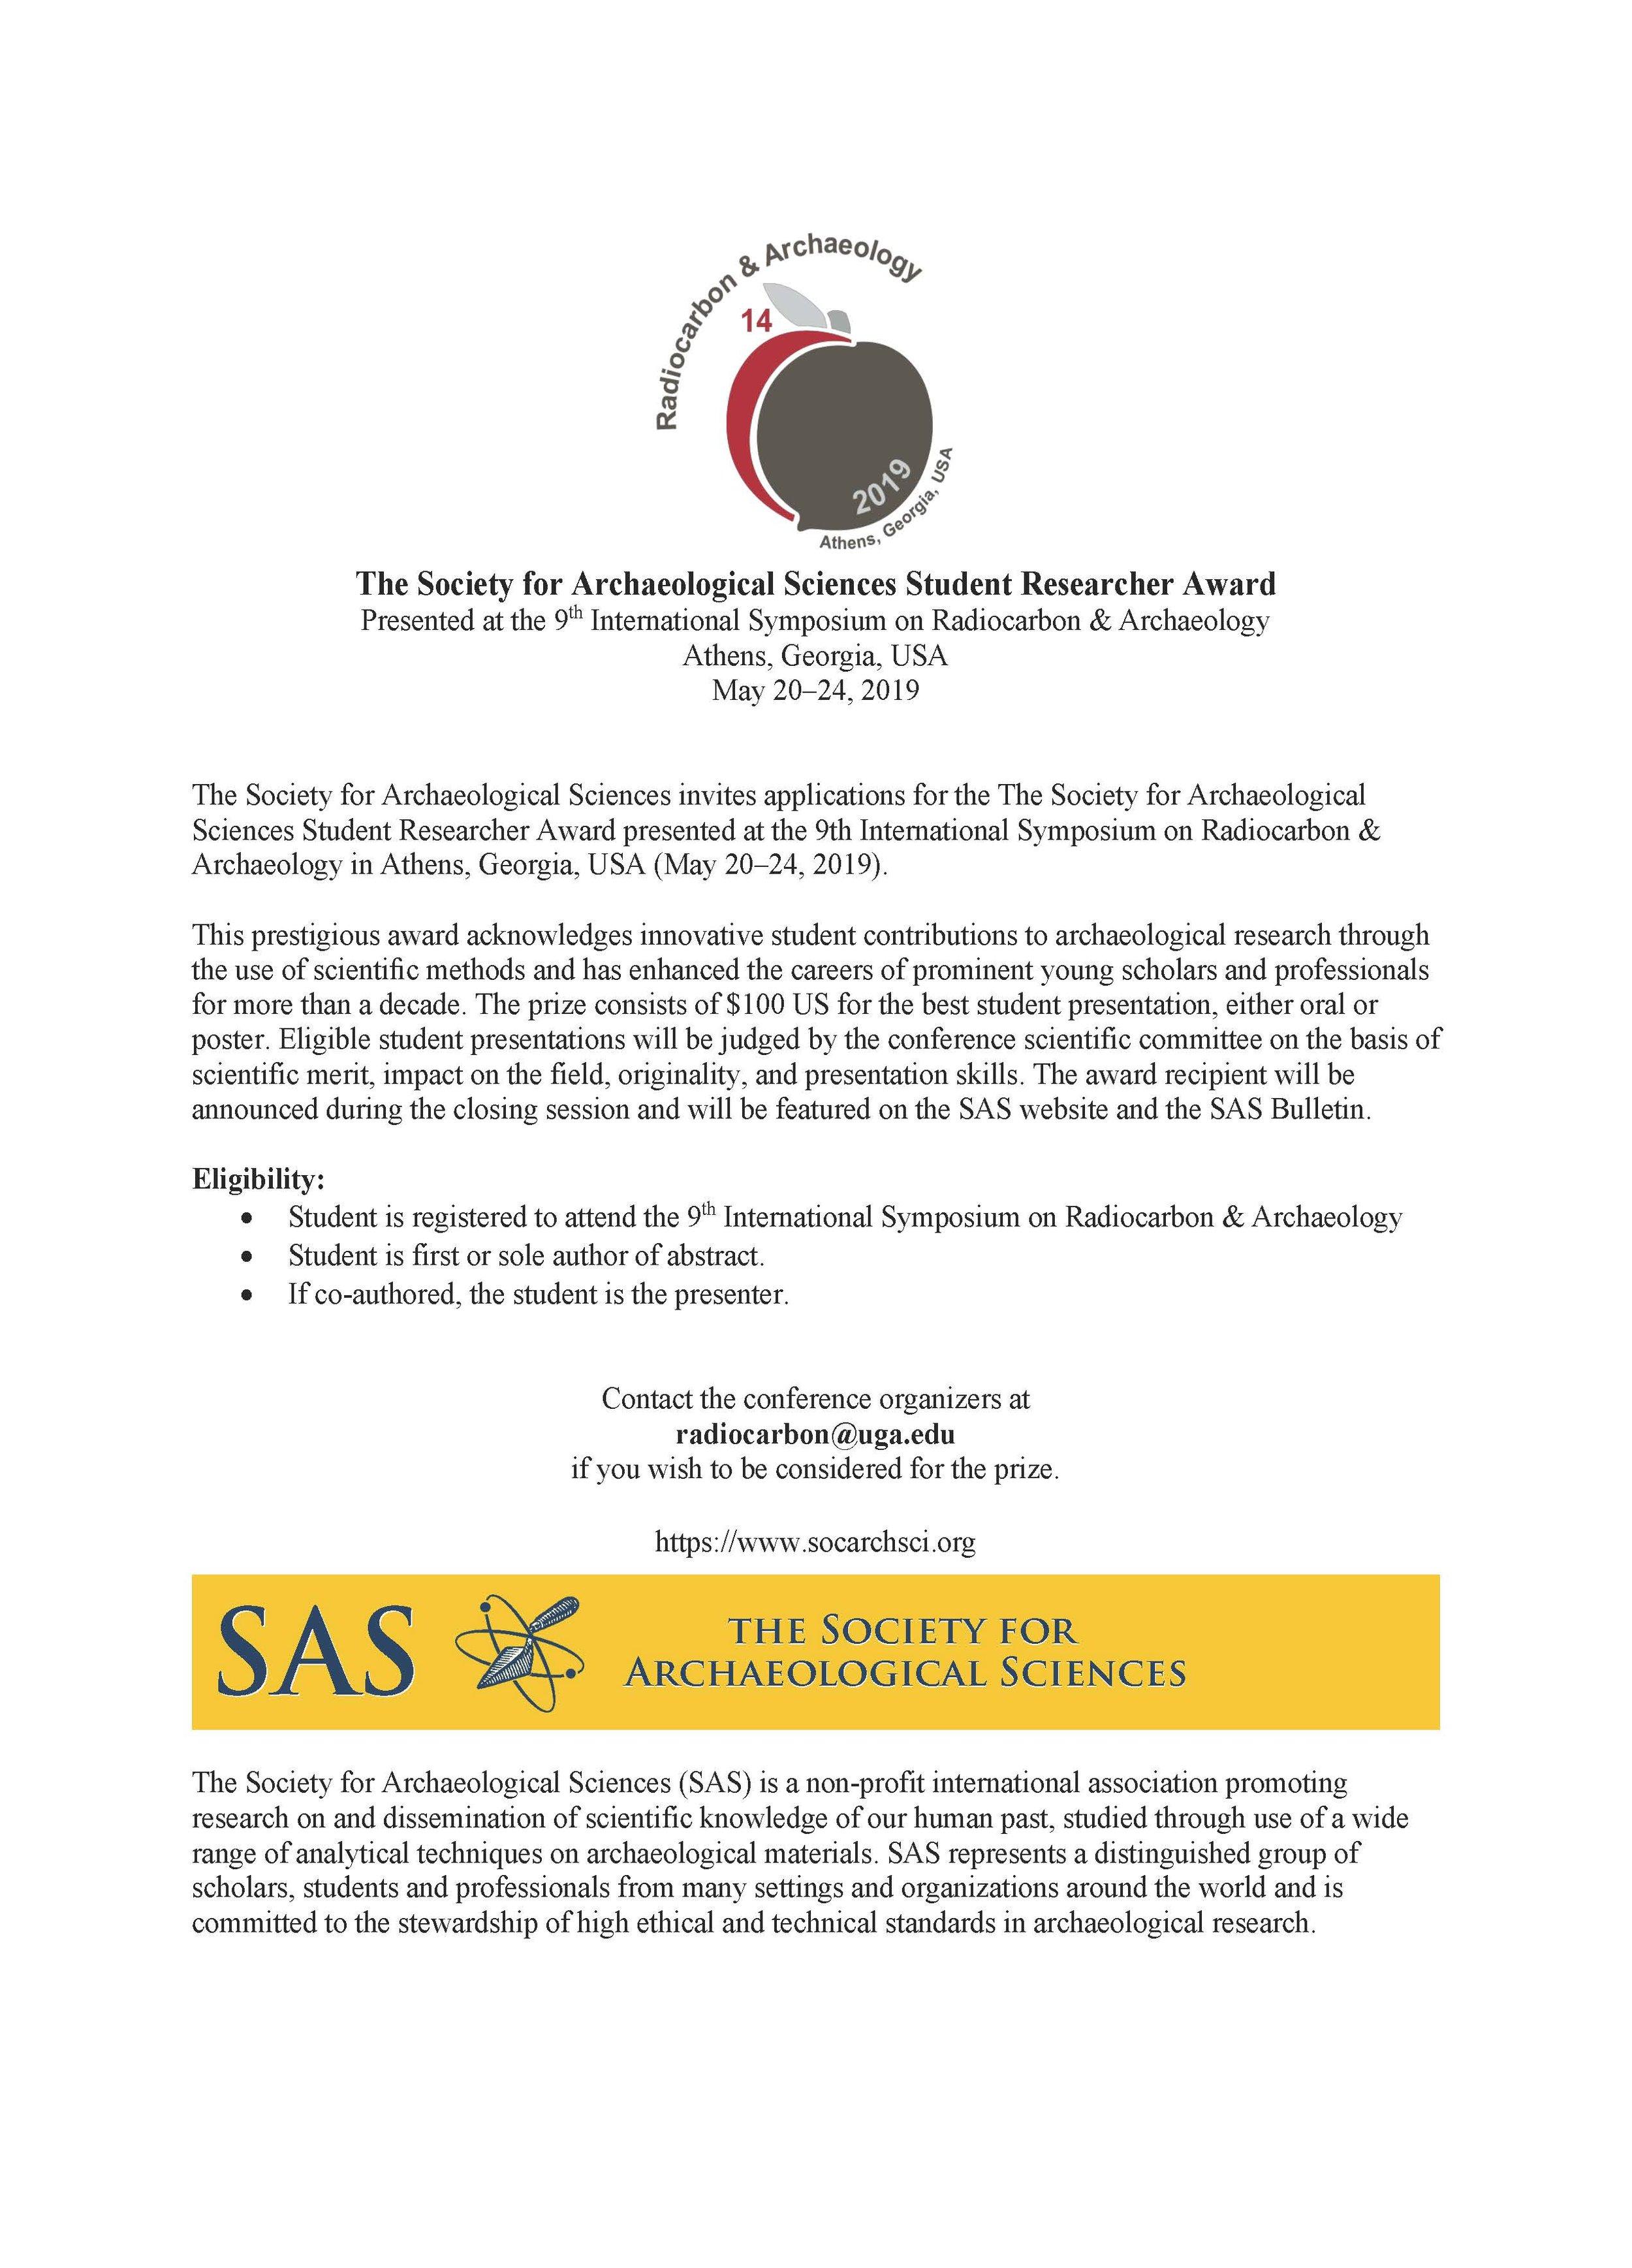 SAS student prize Announcment.jpg